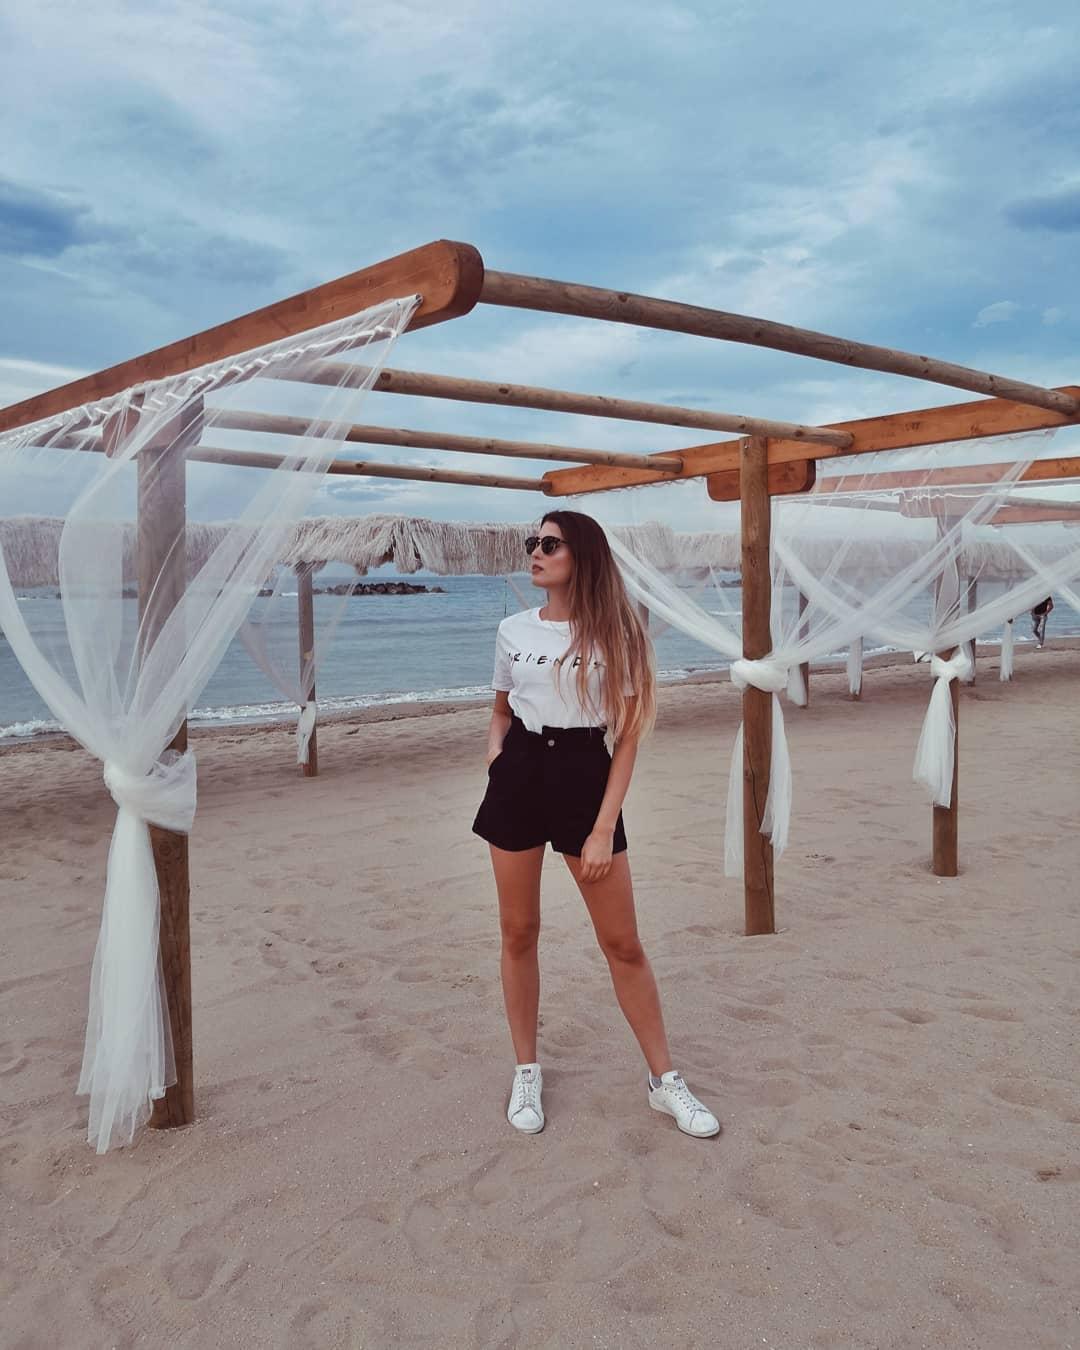 "Monica: ""Do you have a plan?"" Phoebe: ""I don't even have a pla.  @silviacaravaggio grazie per questa maglietta stupenda, ily  #friendstvshow #friendstshirt #hm #rayban #raybanclubround #longhair #outfitideas #beachlife #beachstyle #slovakgirl #italiangirl #highwaistedshorts #francavillaalmare #italianblogger #influenceritalia #bloggeritalia #italianlifestyle #asos #beautybloggeritalia #lentiamo #honor10 #igersabruzzo"